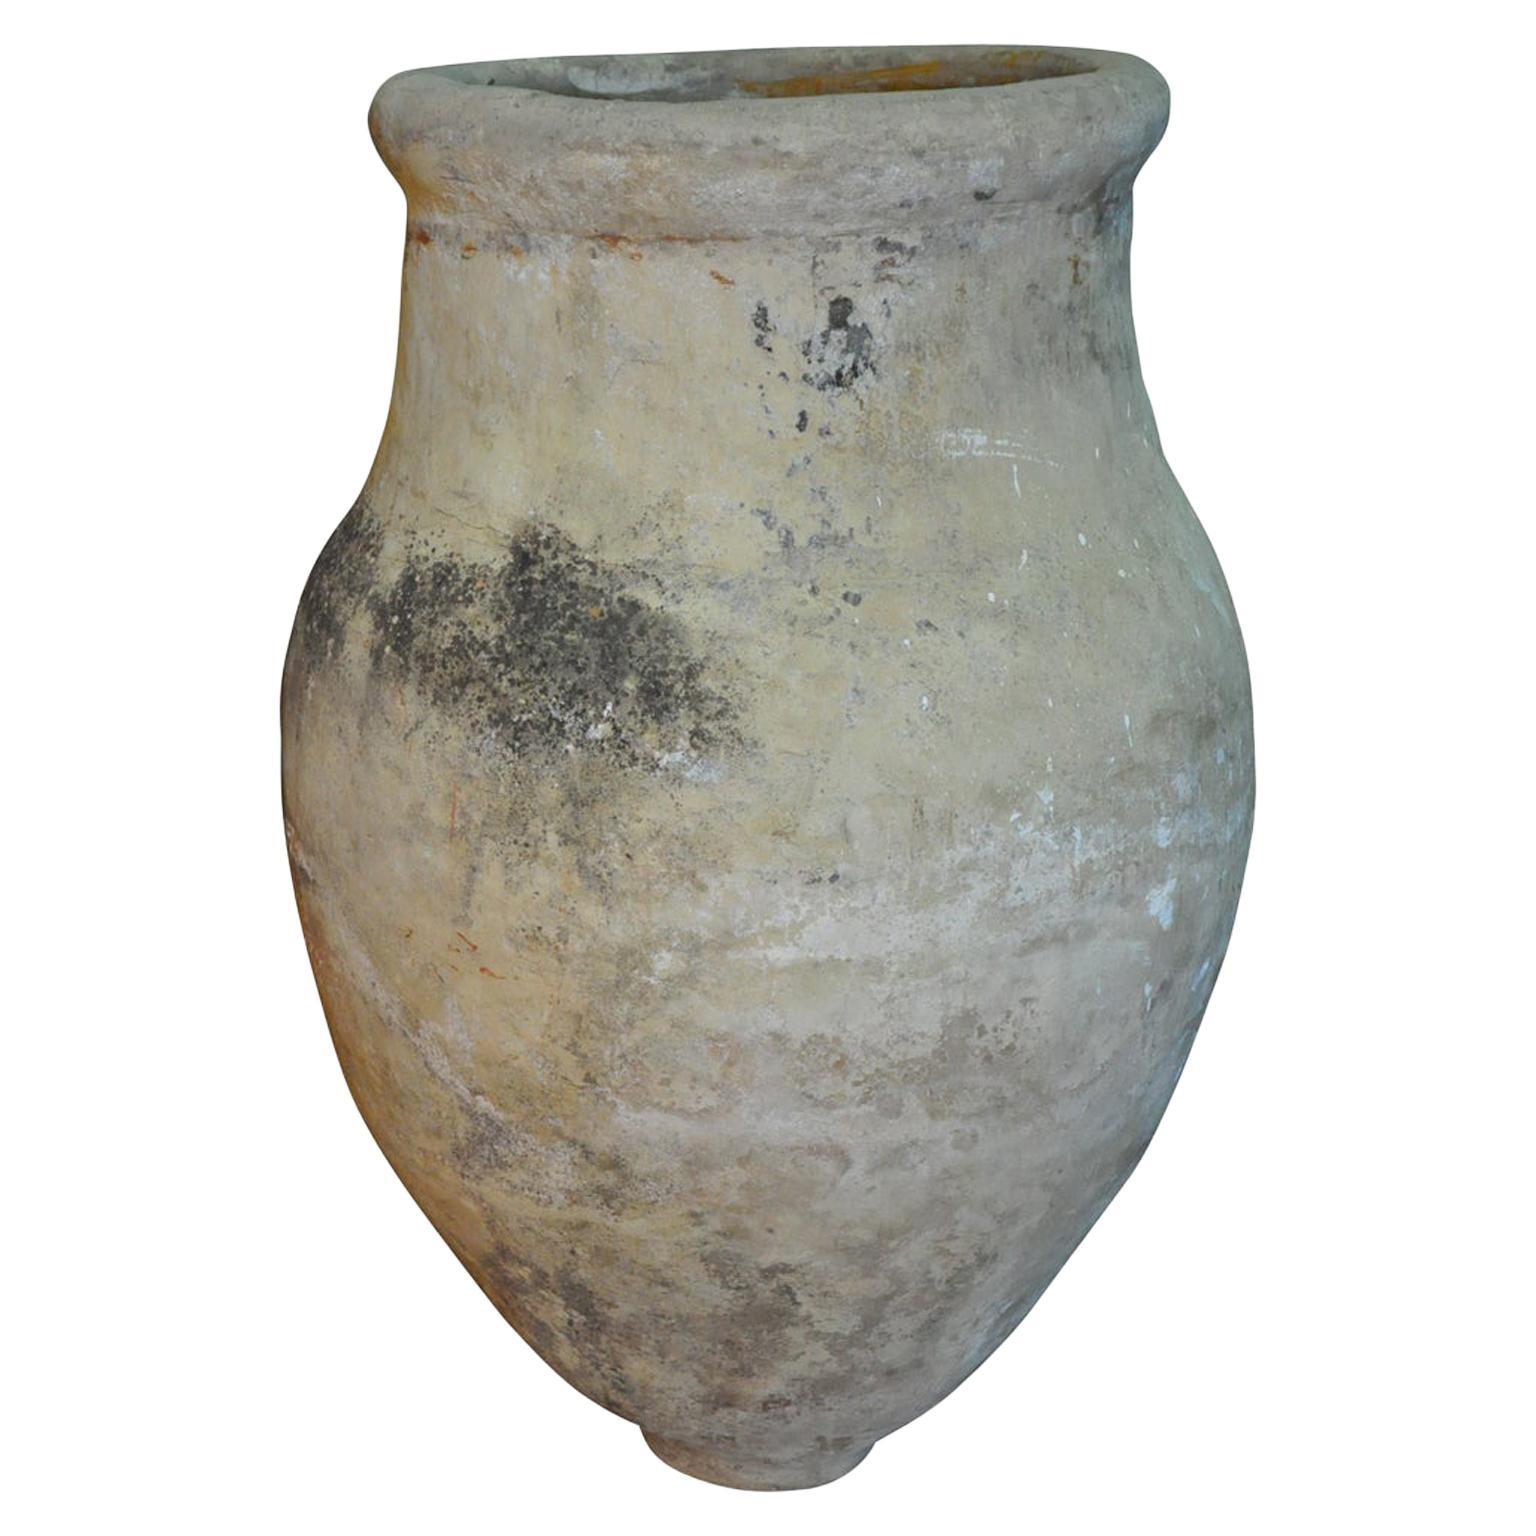 18th Century Monumental Spanish Olive Oil Jar